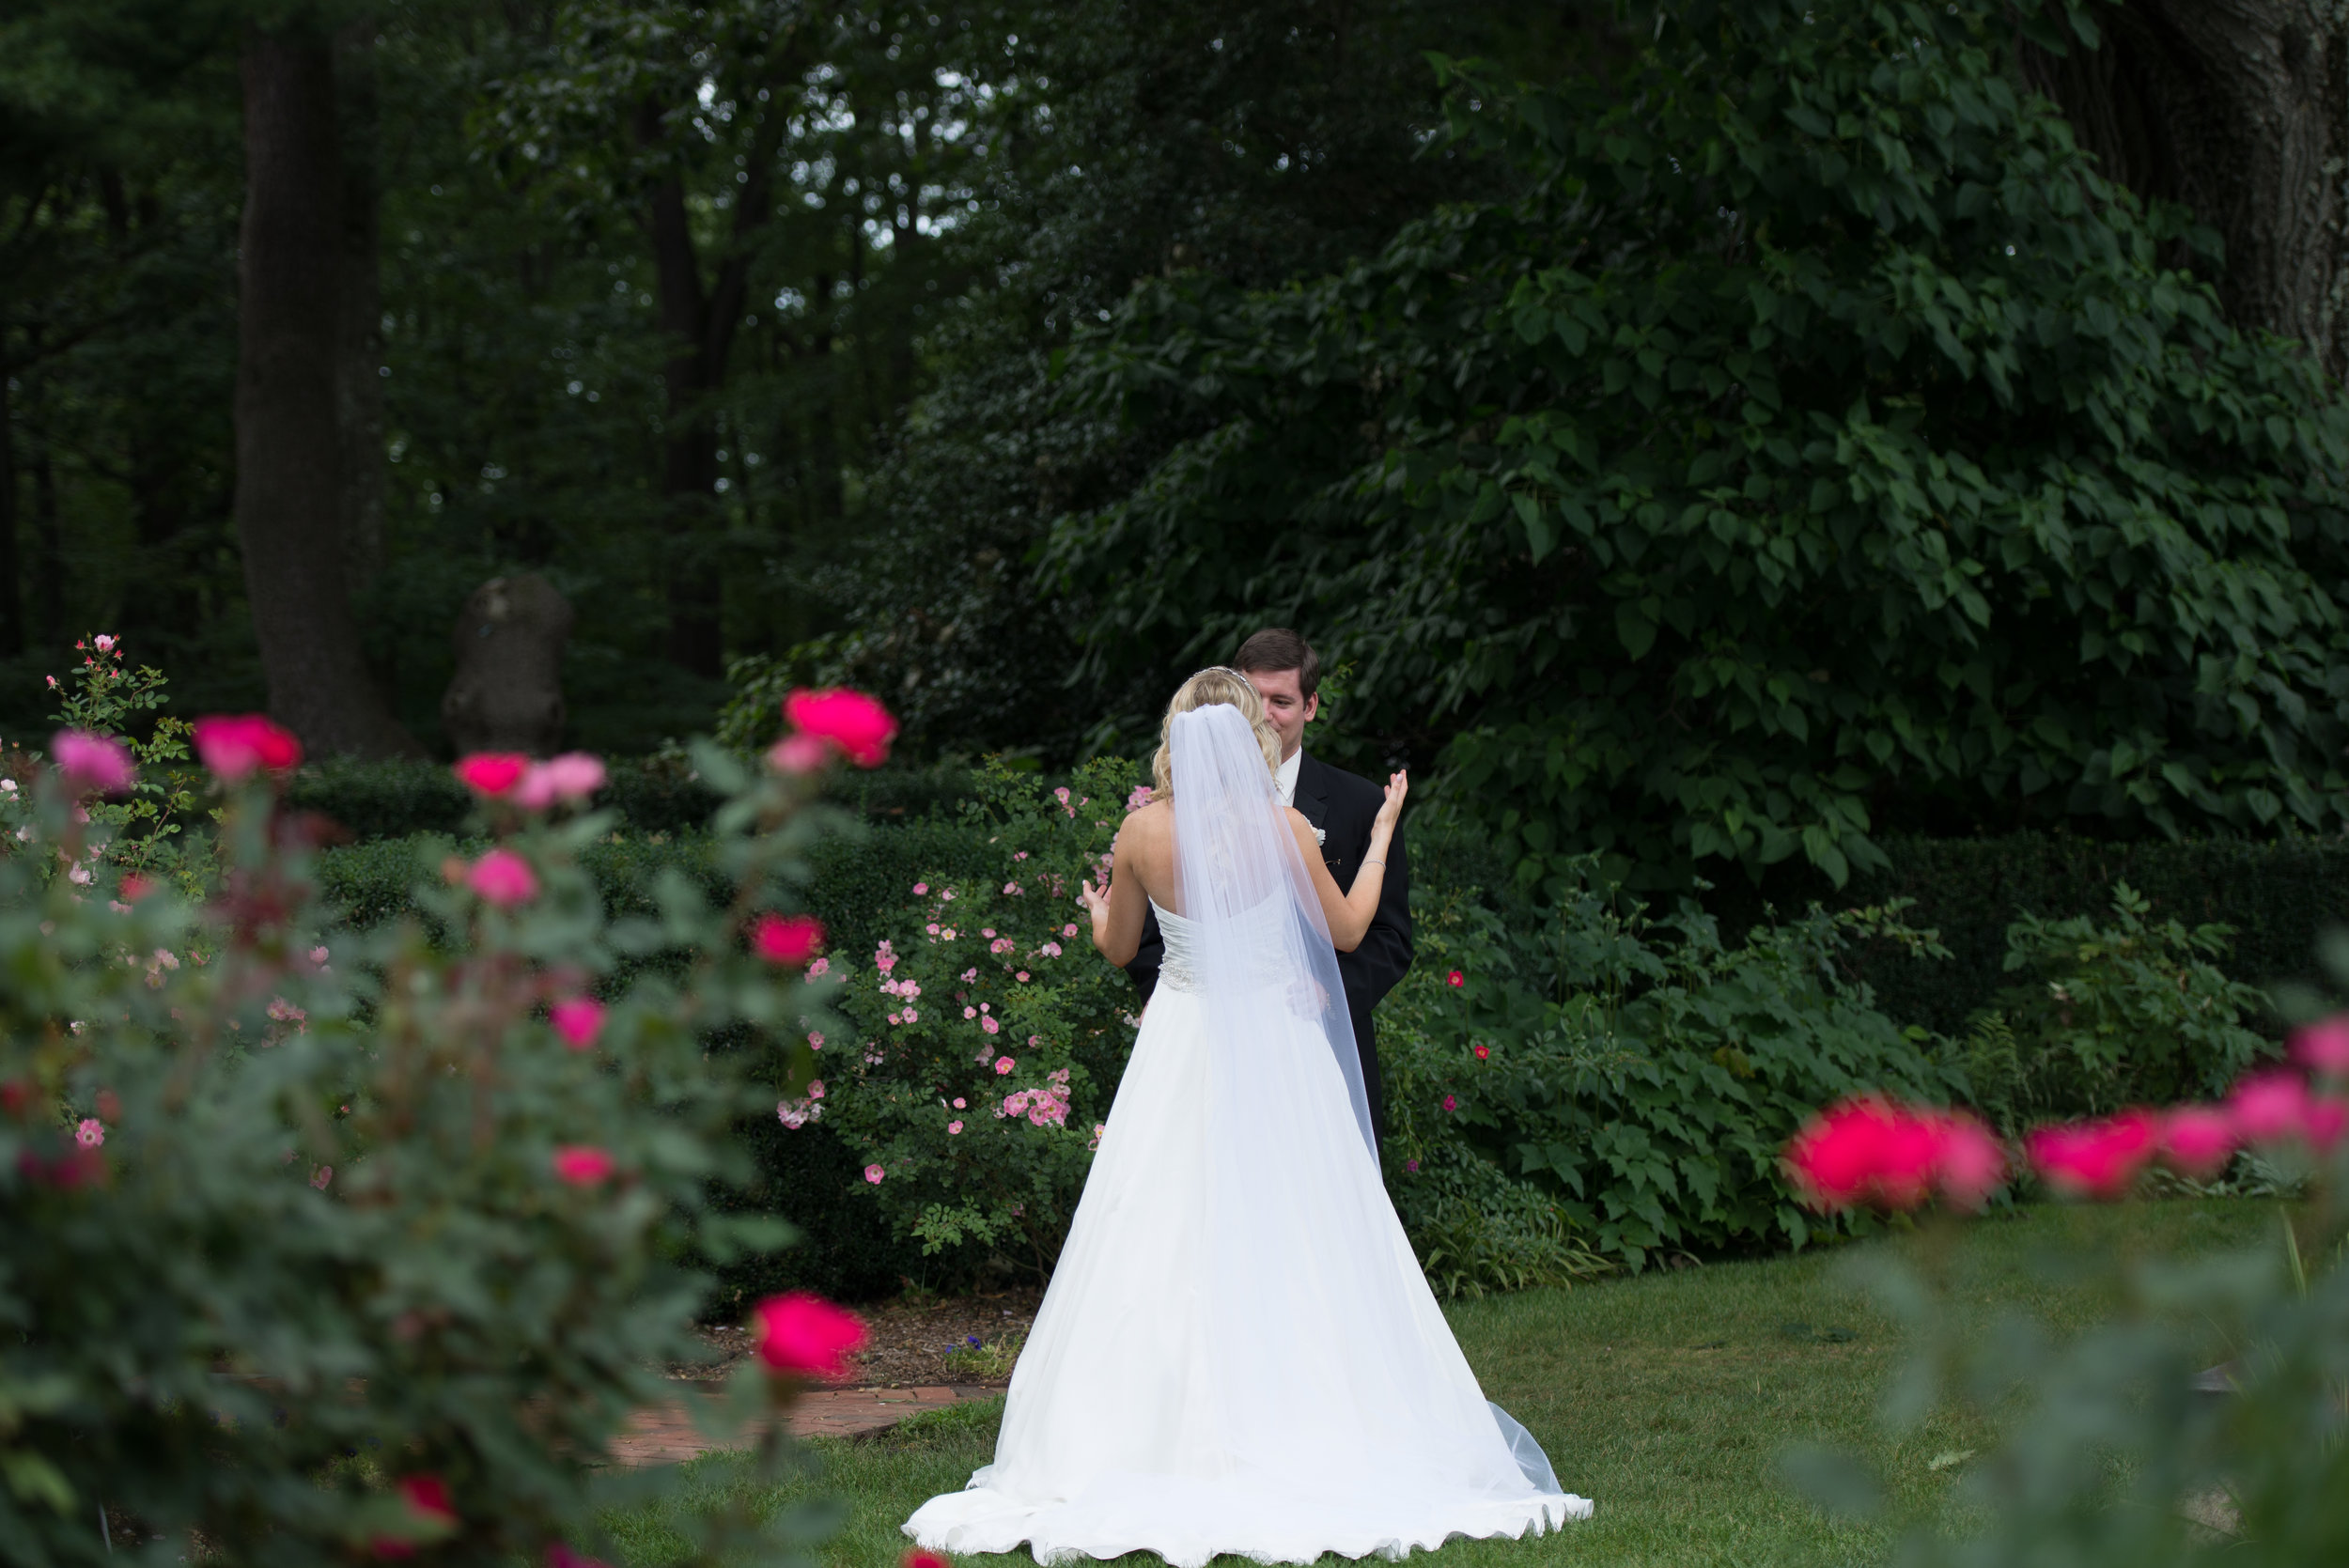 Wedding First Look Photos00946.jpg